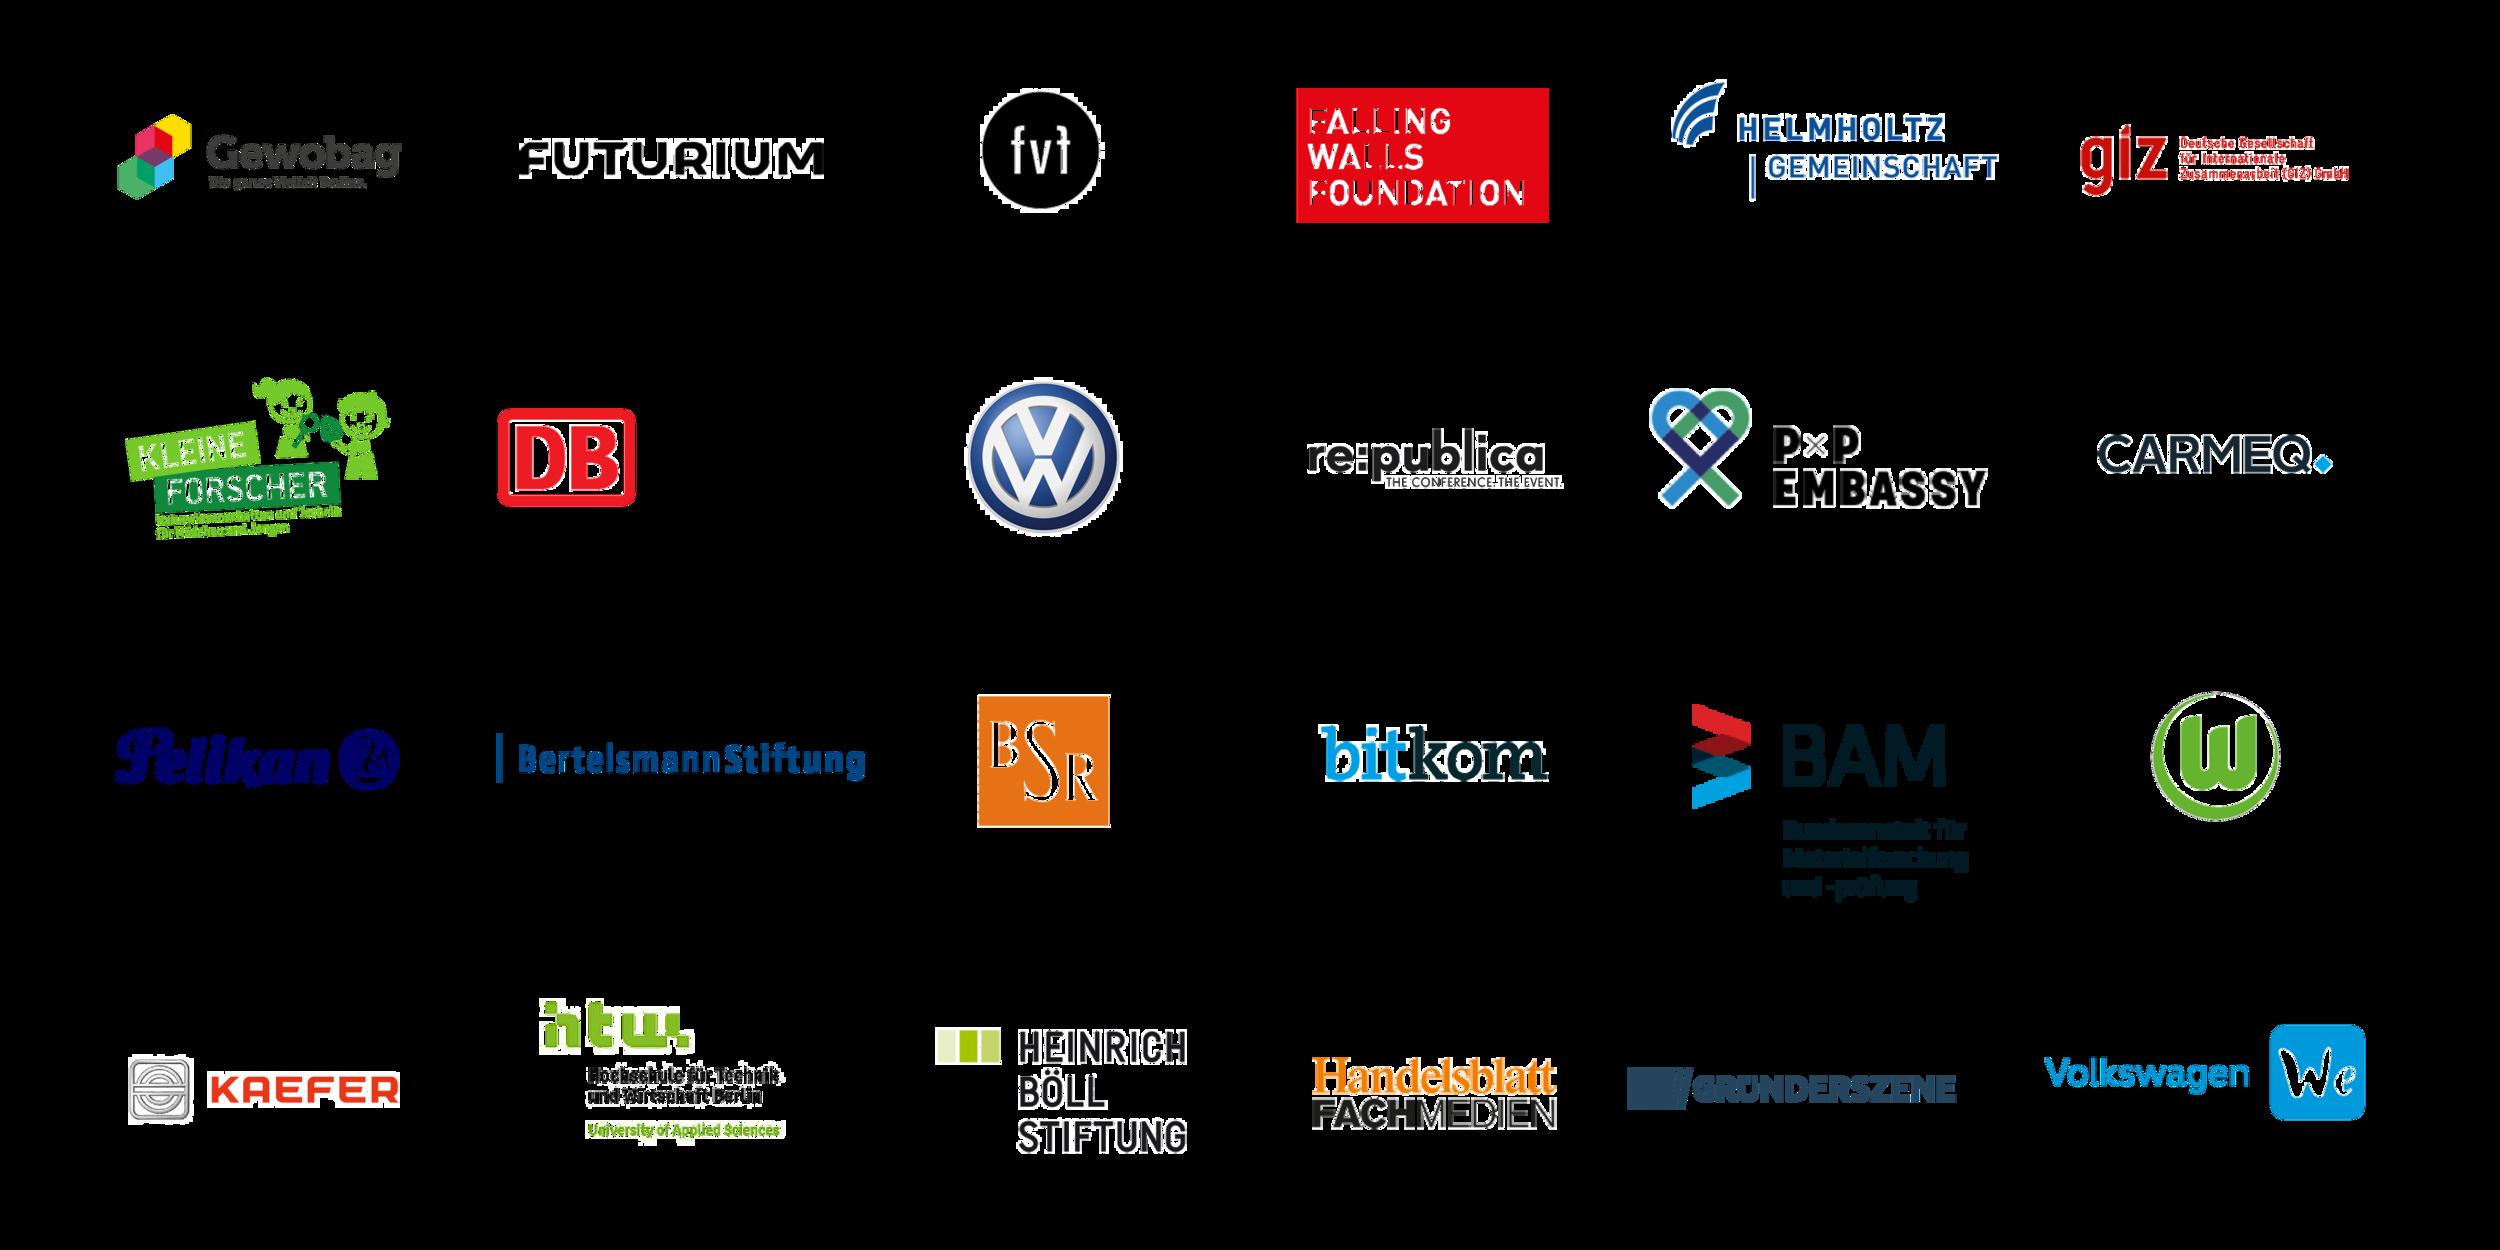 Alle-Logos-Referenzen-BI_Anordnung190926-frei.png